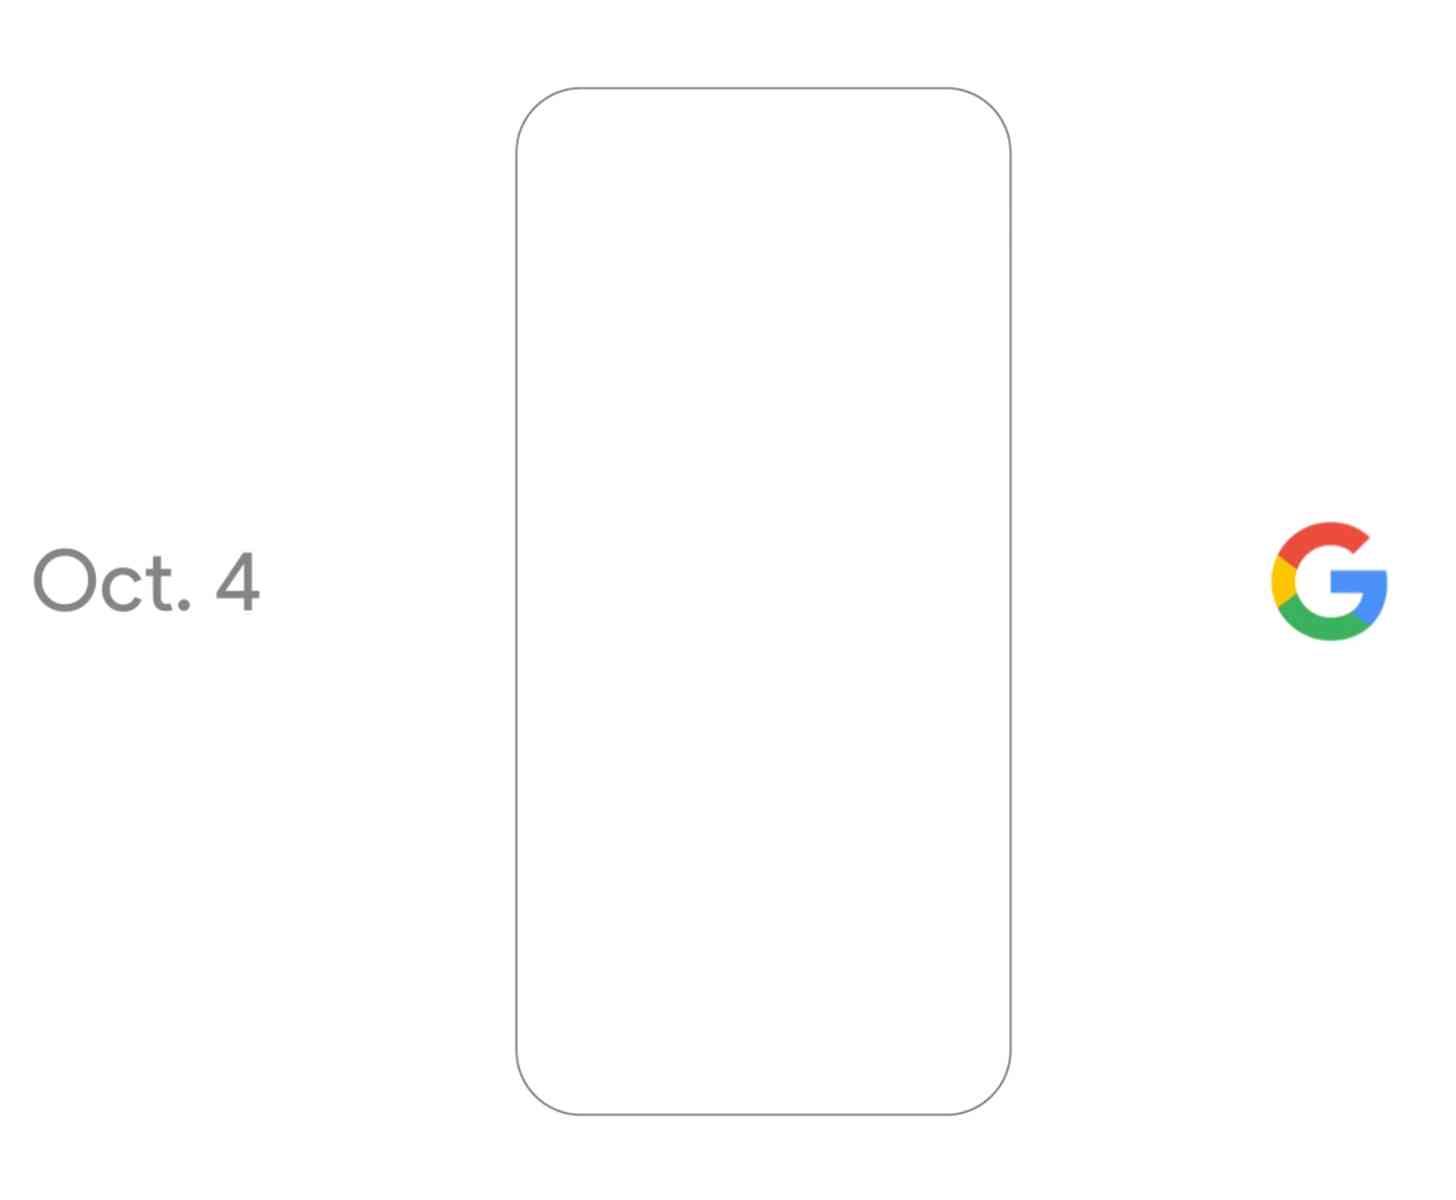 Google event October 4